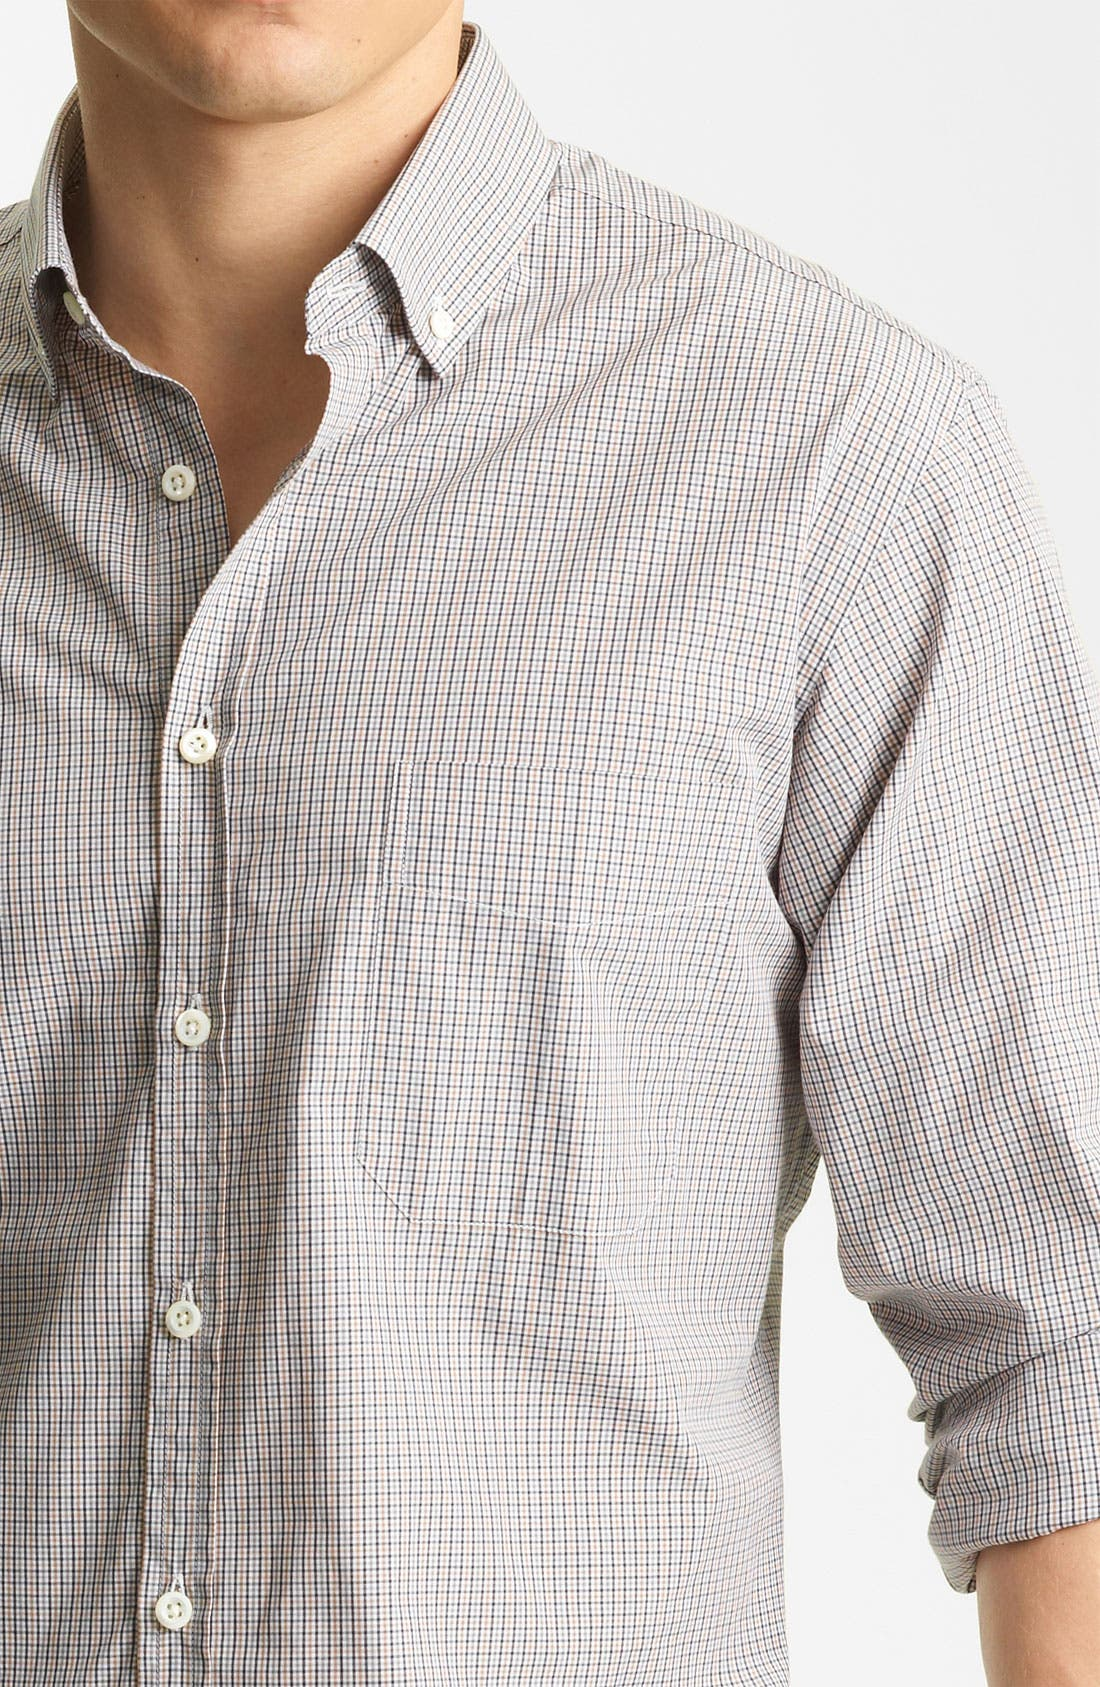 Alternate Image 3  - Billy Reid 'Rosedale' Micro Check Woven Shirt